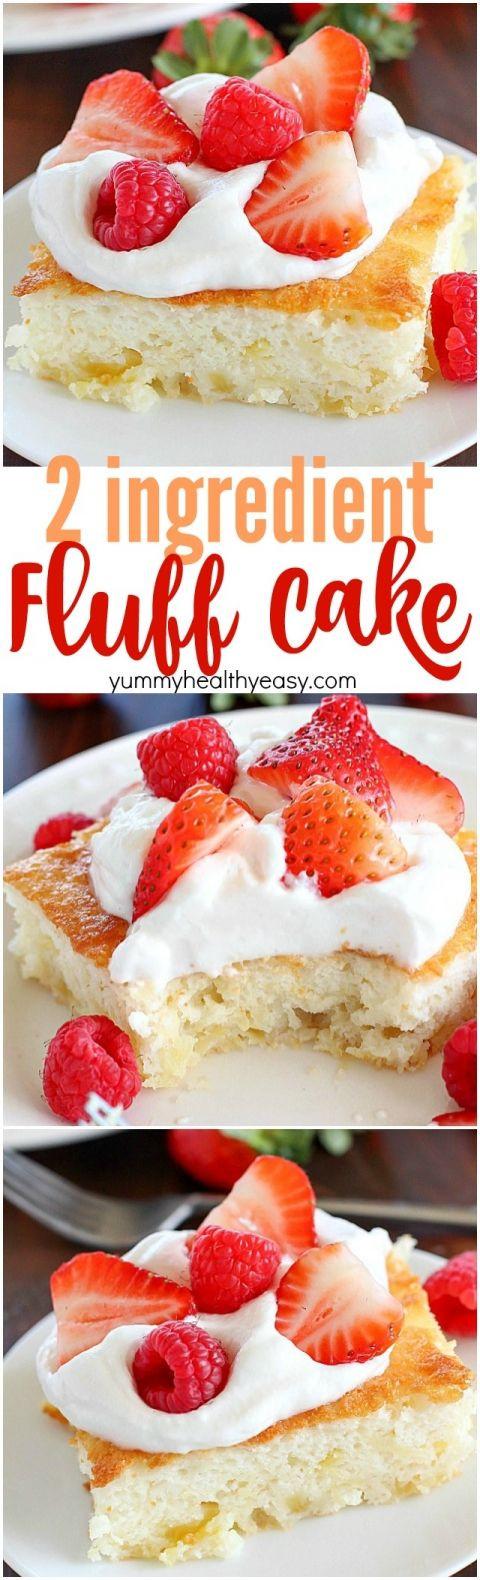 Delicious Low Calorie Desserts  Best 25 Low calorie cheesecake ideas on Pinterest